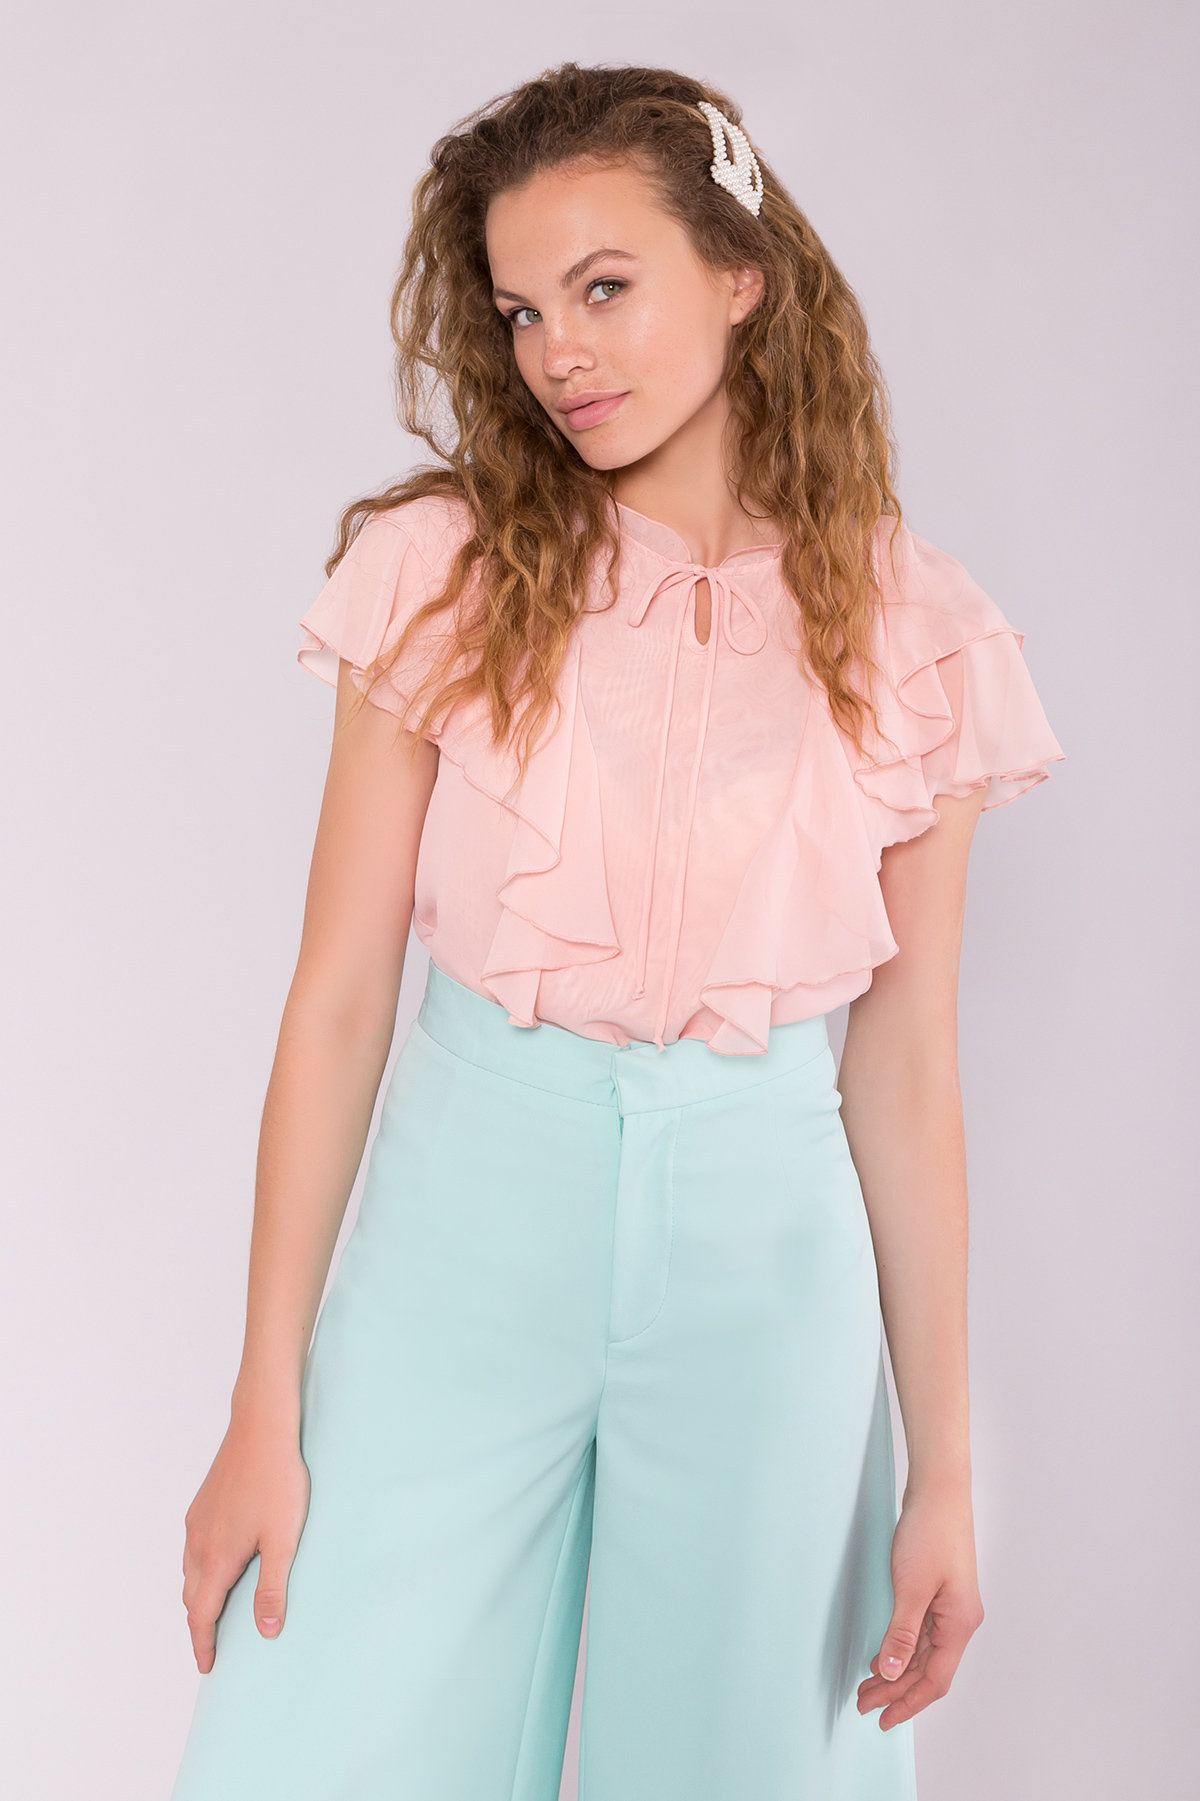 Блуза Дайан 7235 АРТ. 42831 Цвет: Пудра 5 - фото 3, интернет магазин tm-modus.ru